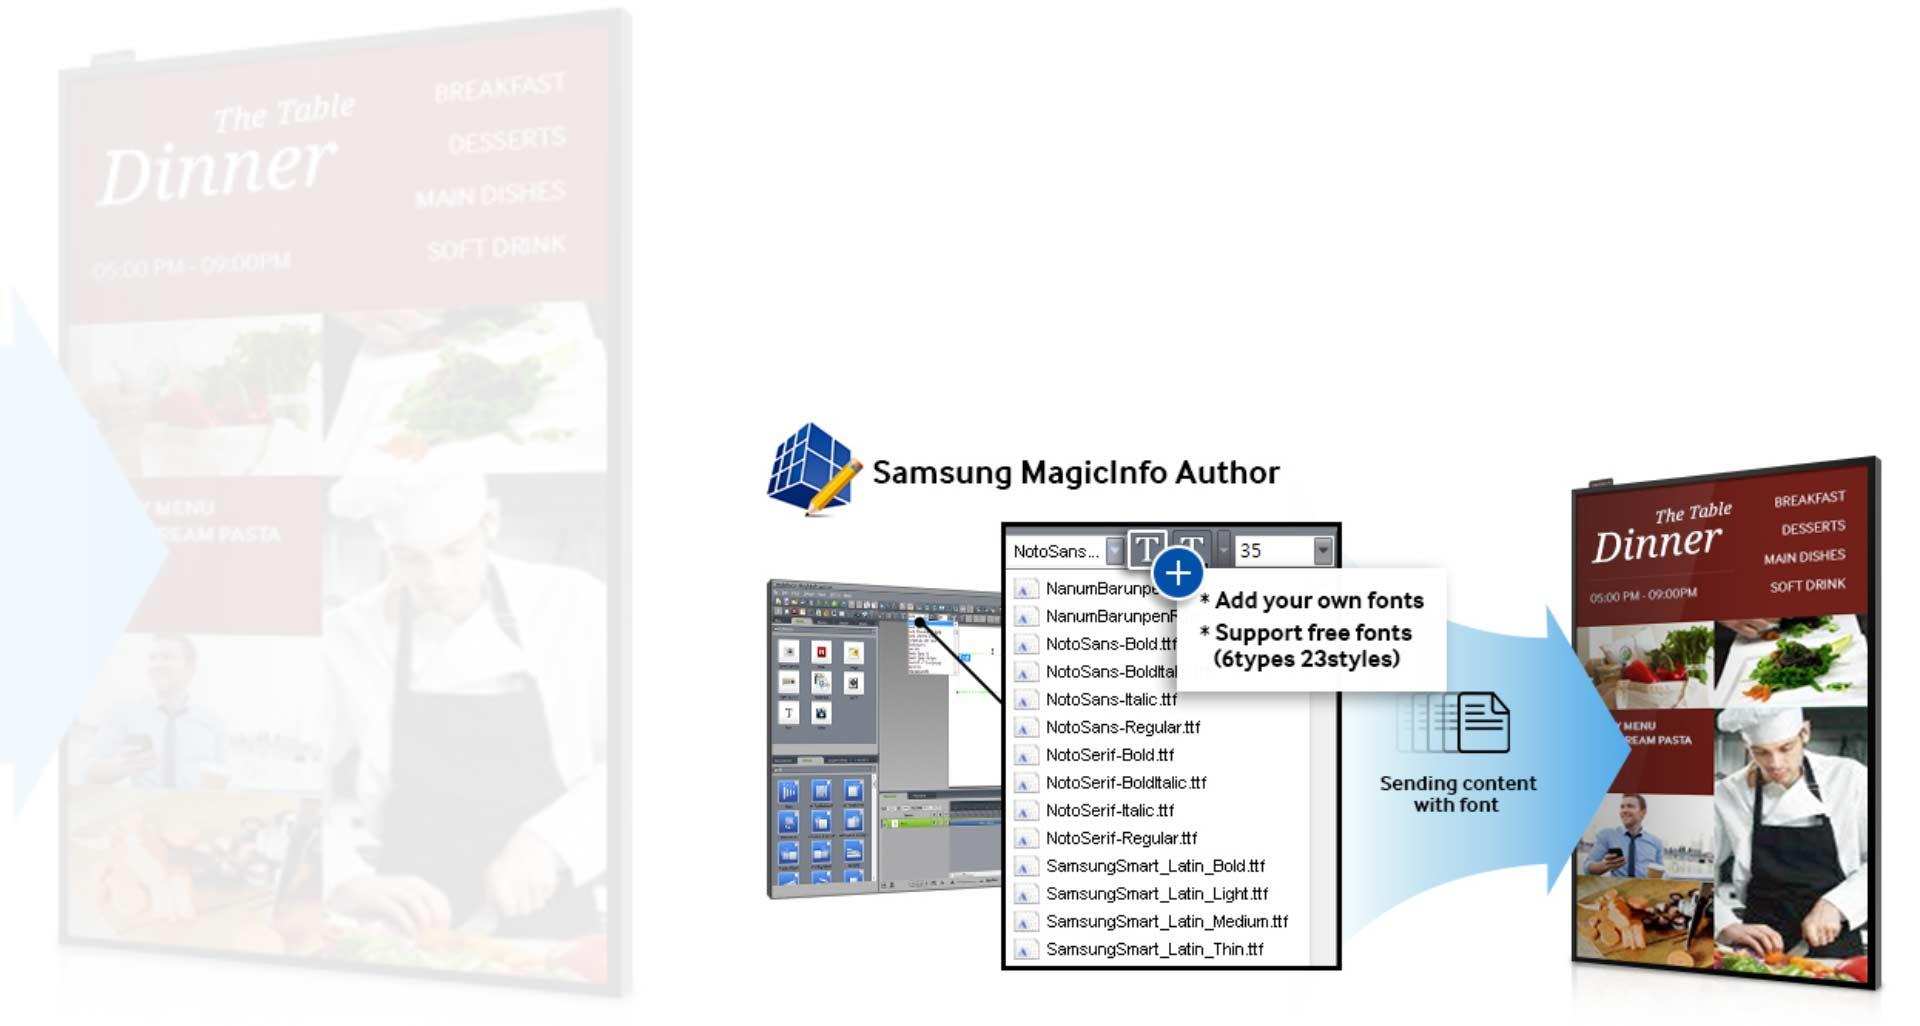 samsung 5 Transform your business messaging with a brilliant  - نمایشگر اطلاع رسان دیجیتال سامسونگ 55 اینچ Samsung Digital Signage DB55E